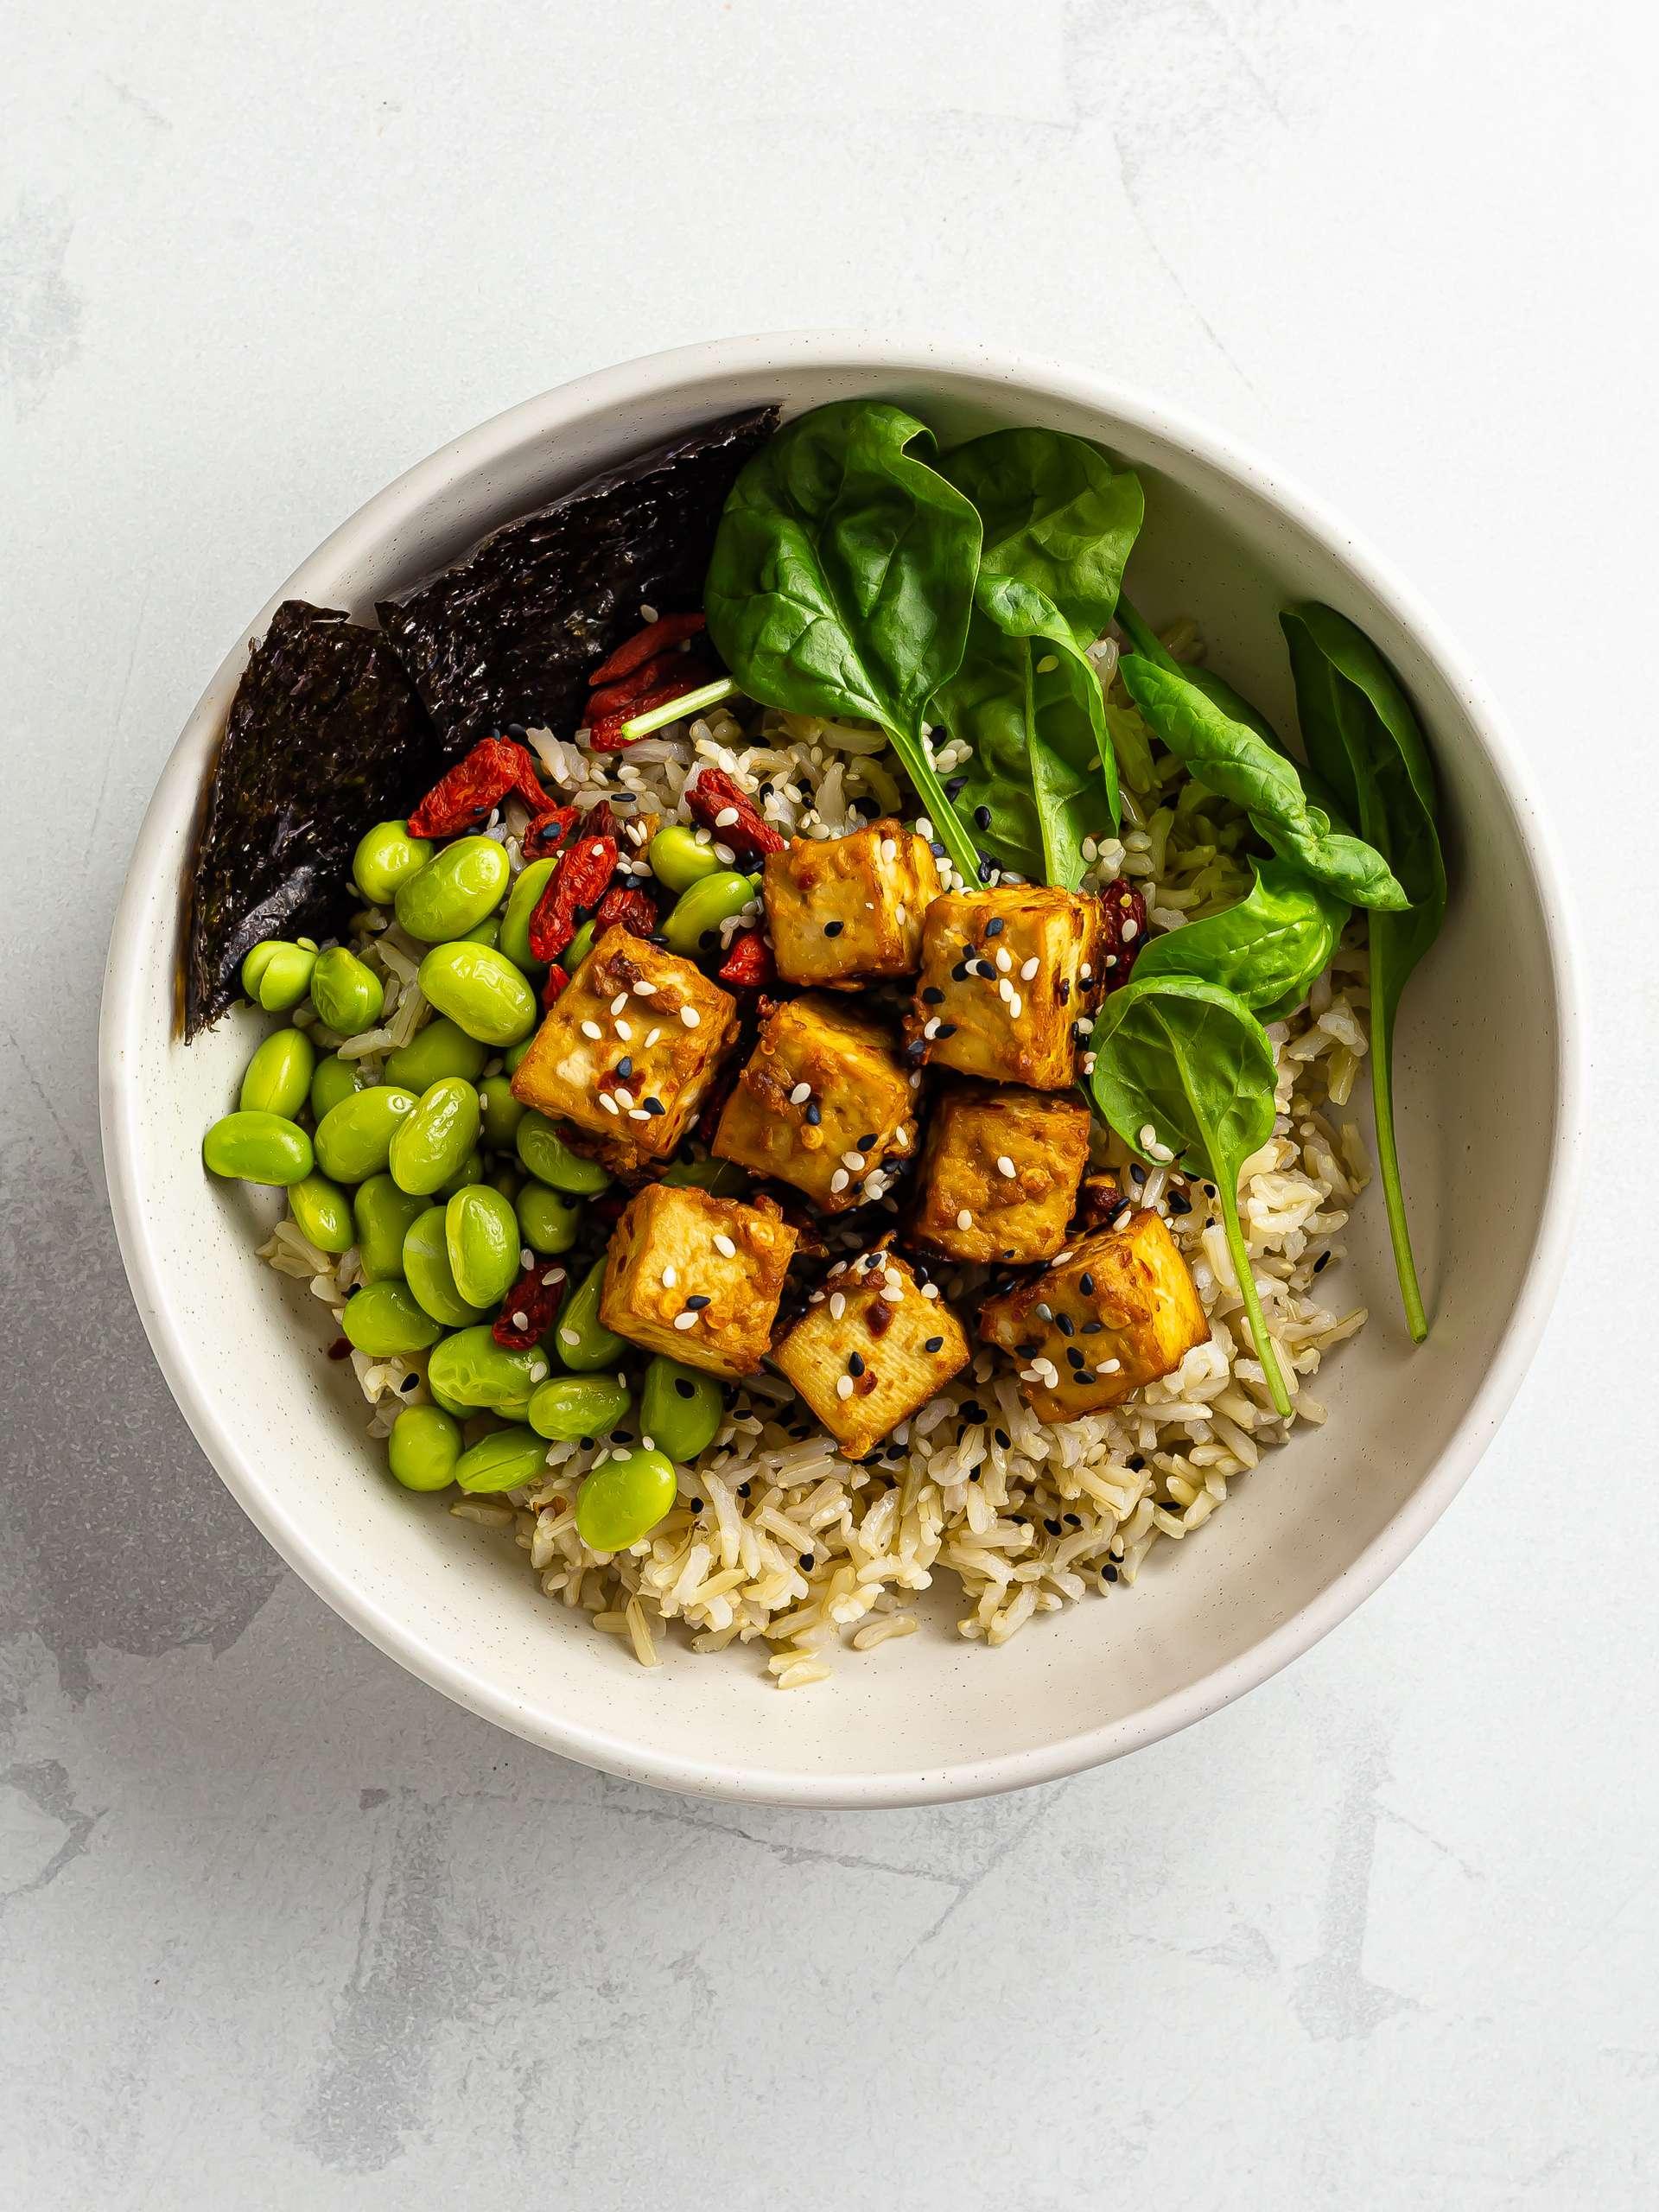 miso marinated tofu bowl with rice and edamame